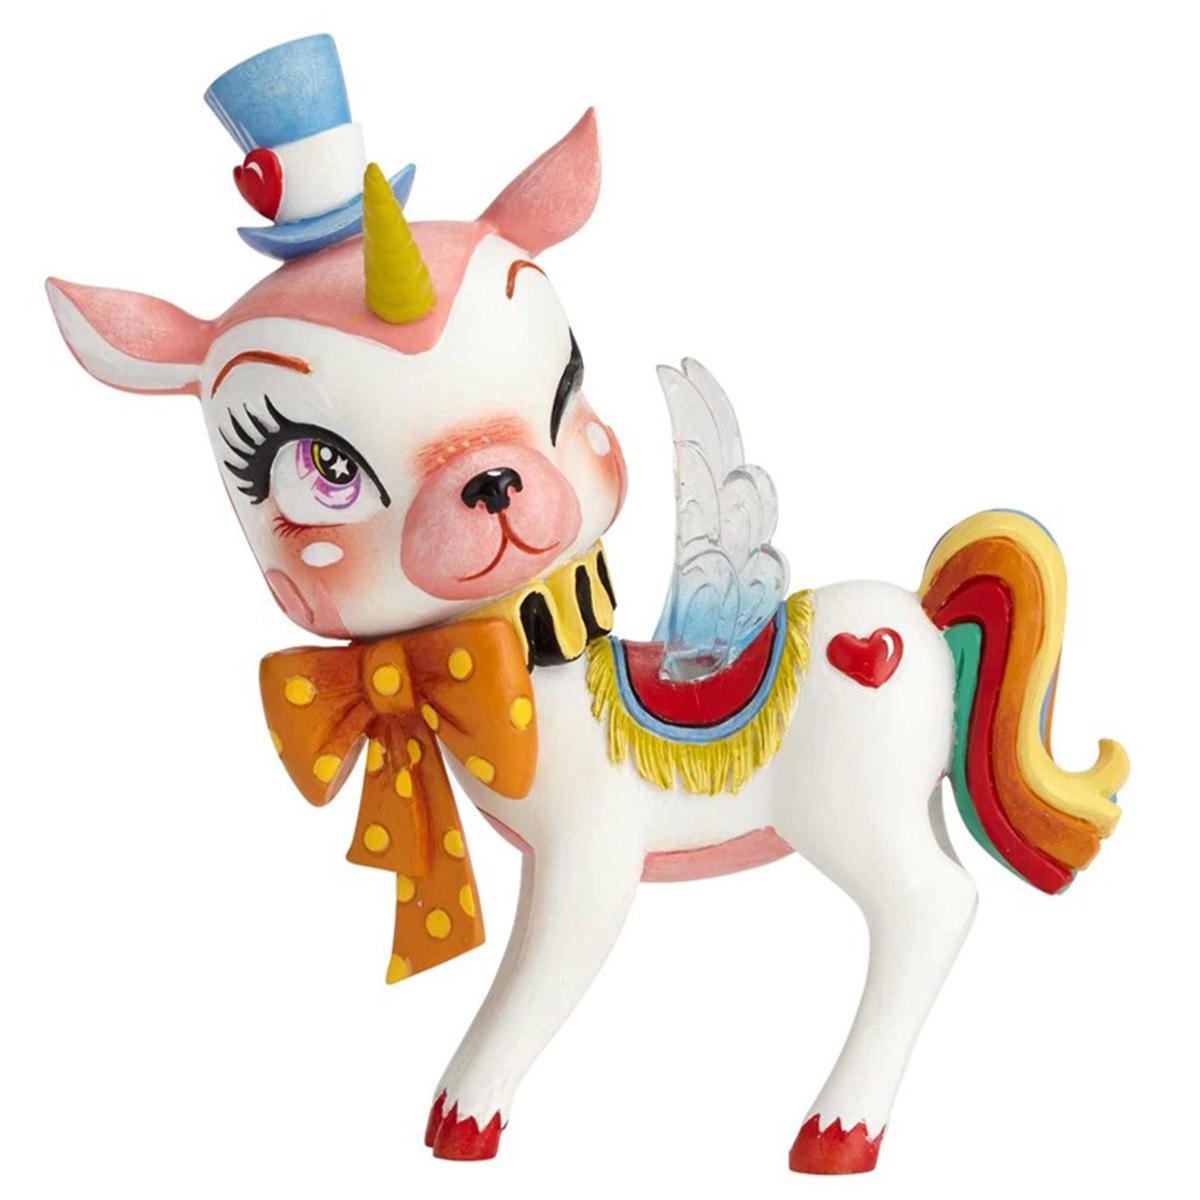 Figurine créateur \'Dear Unicorn\' Light of Day (Miss Mindy) - 14x136x65 cm - [Q3130]